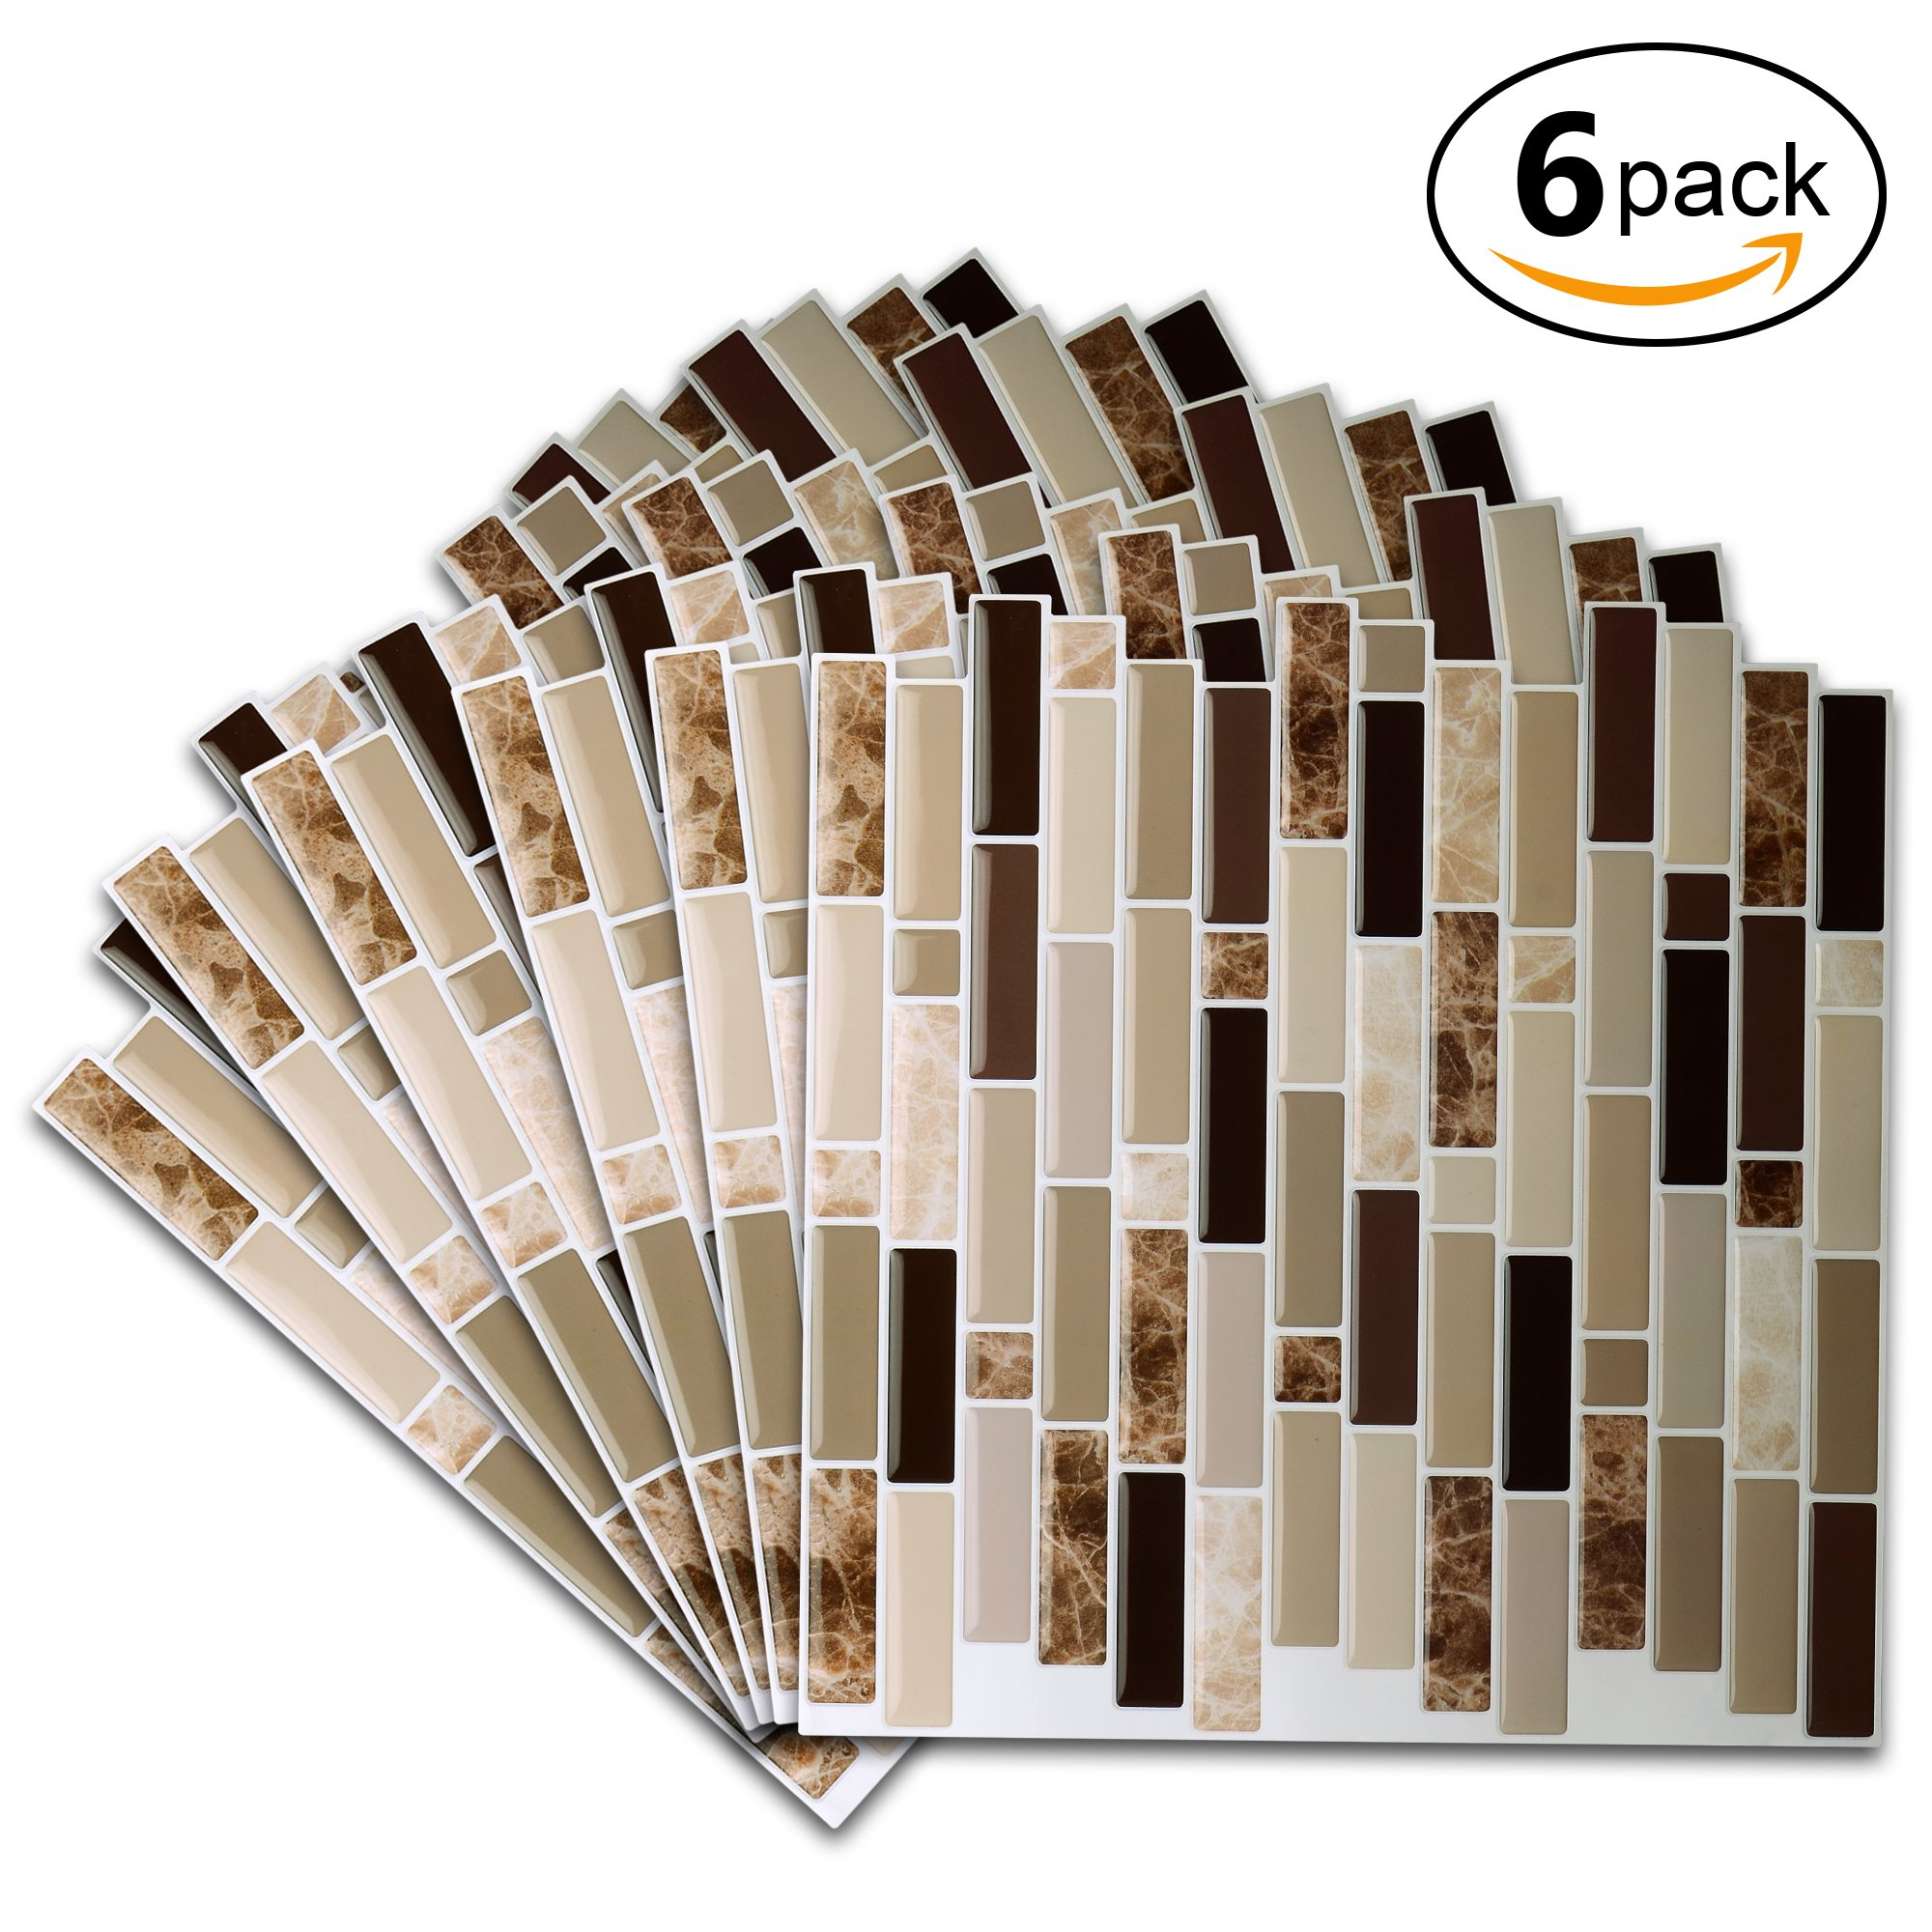 vamos tile premium anti mold peel and stick tile backsplash stick on backsplash 696535978053 ebay. Black Bedroom Furniture Sets. Home Design Ideas